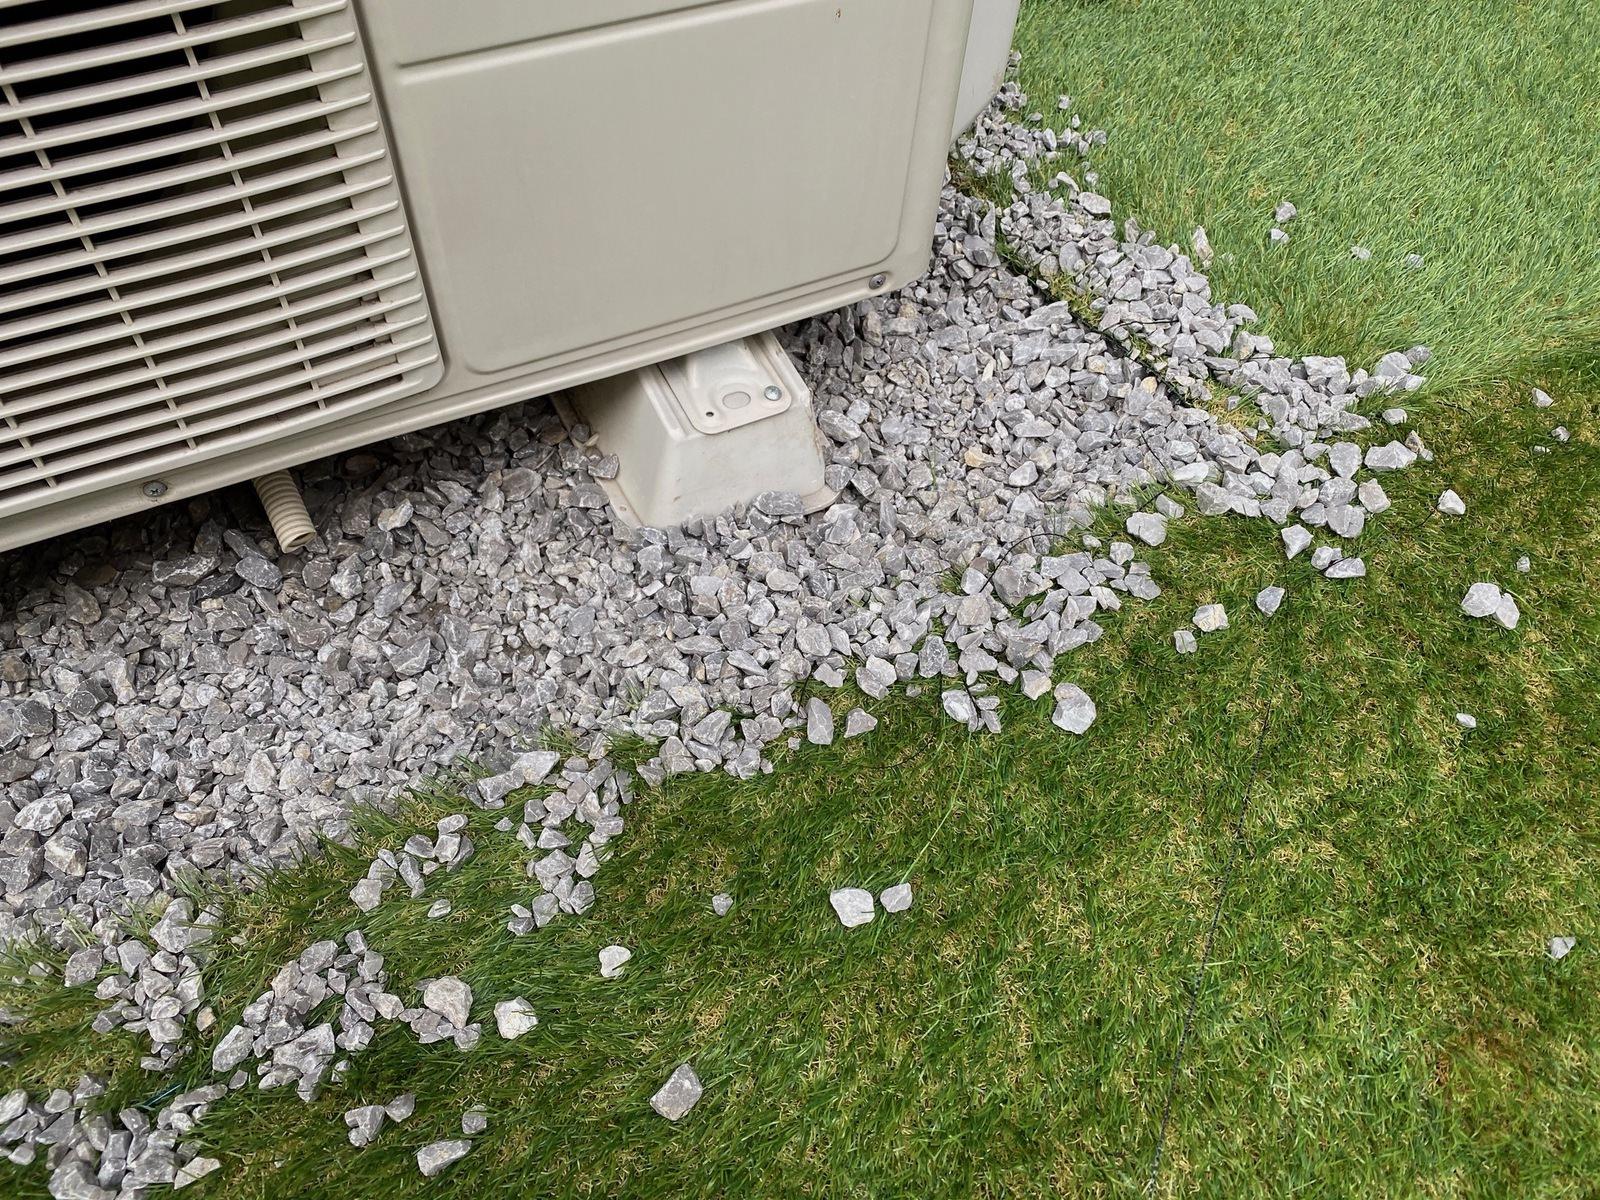 Artificial-lawn-in-backyard-review-16.jpeg